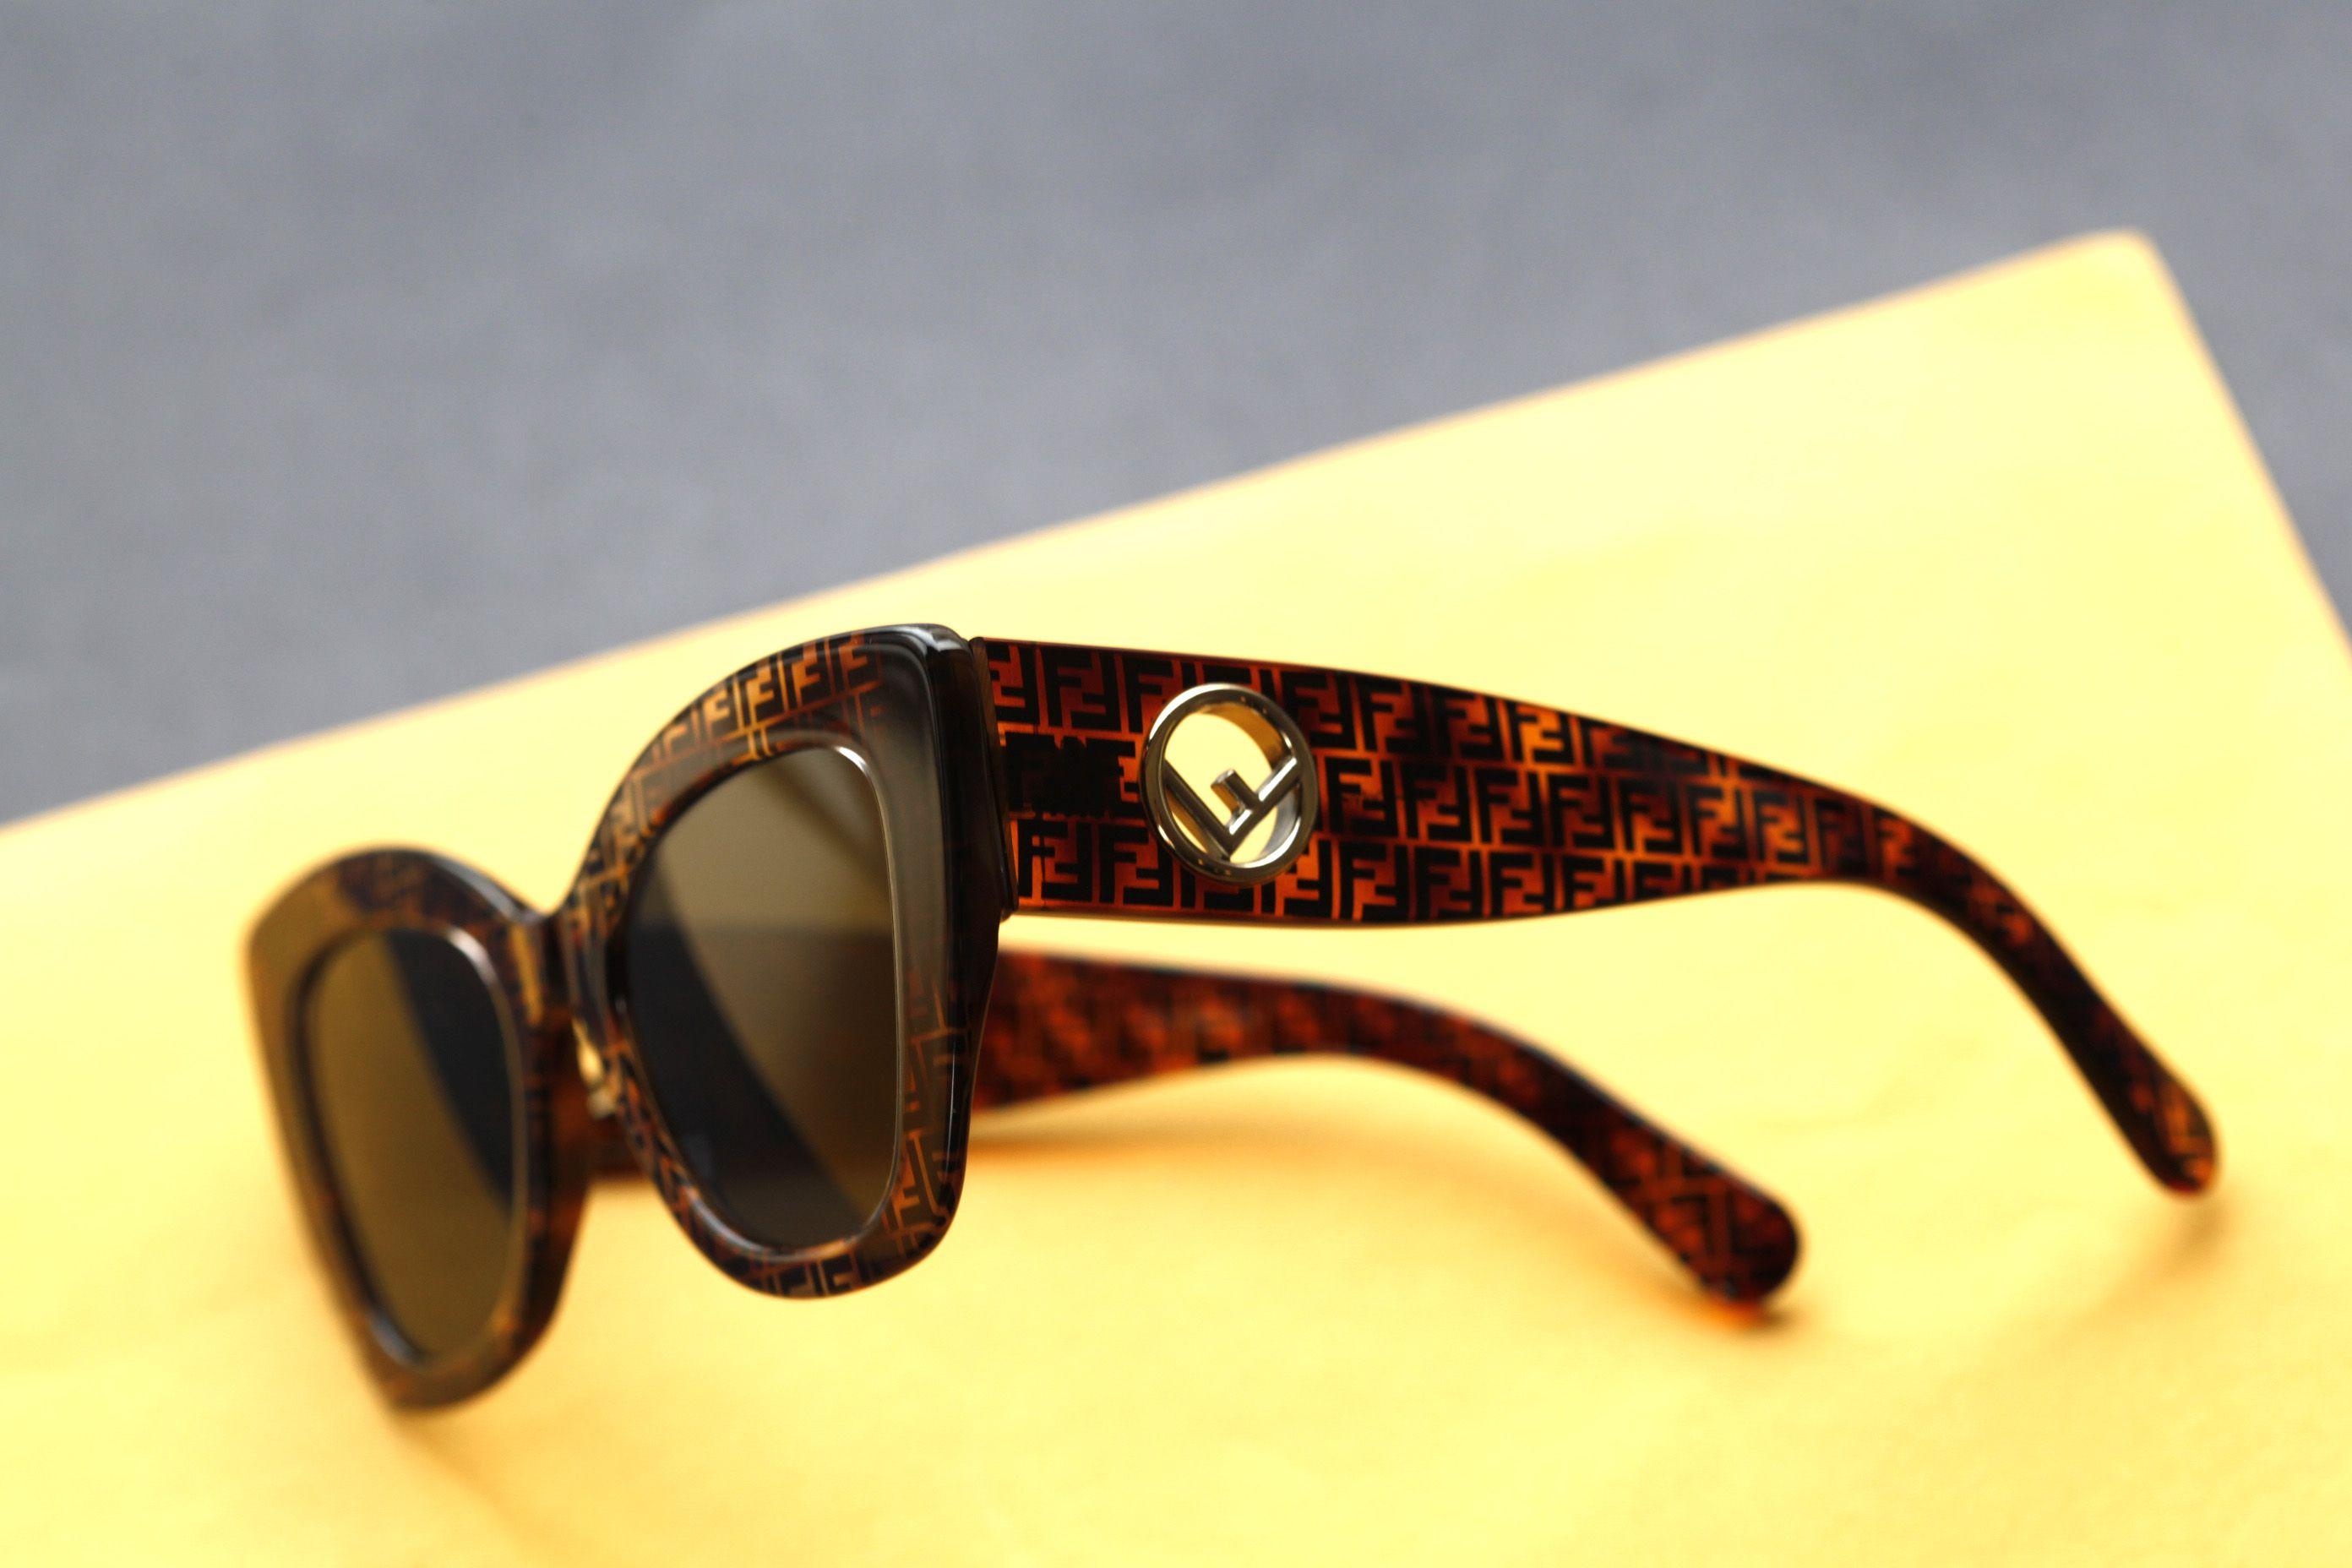 99922a22e9fb0 FENDI FF 0327 S - ÓCULOS DE SOL  fendi  fendieyewear  oculosdesol   sunglasses